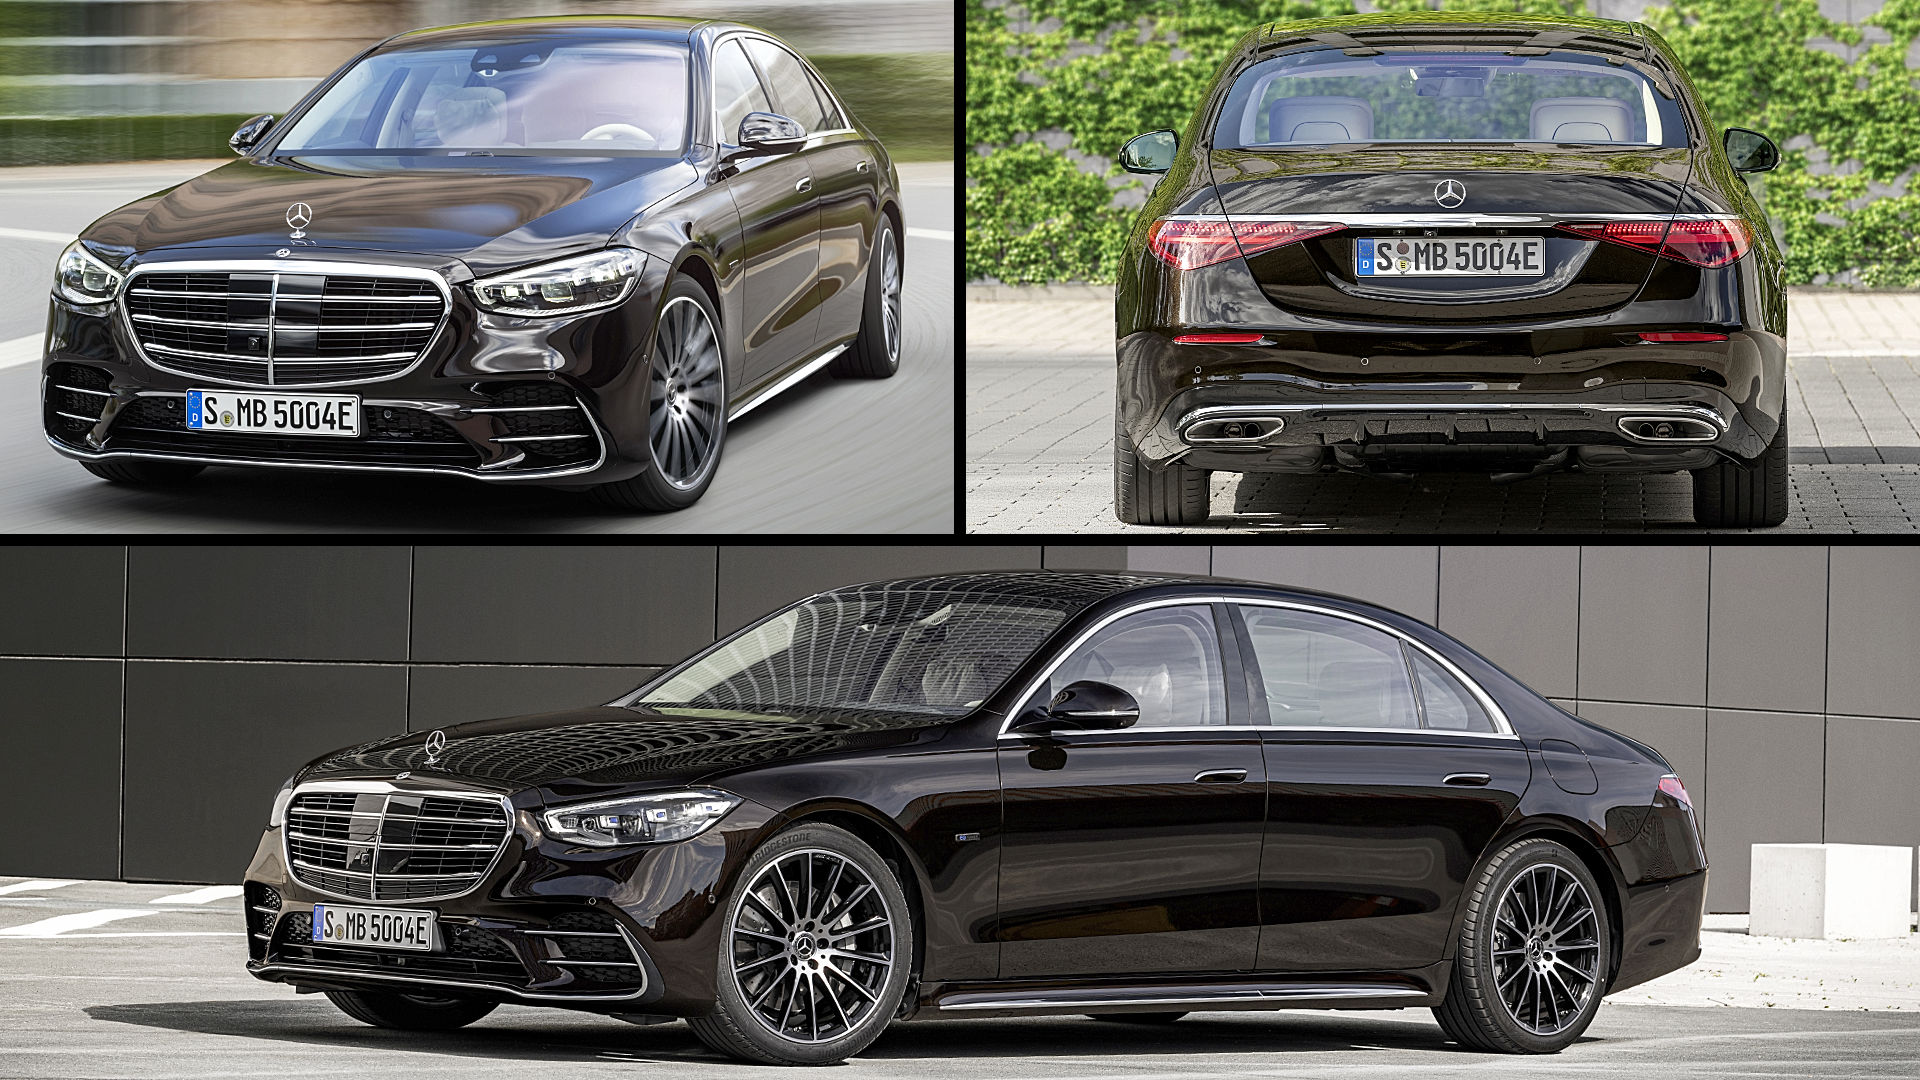 2021 Mercedes S-Class Black